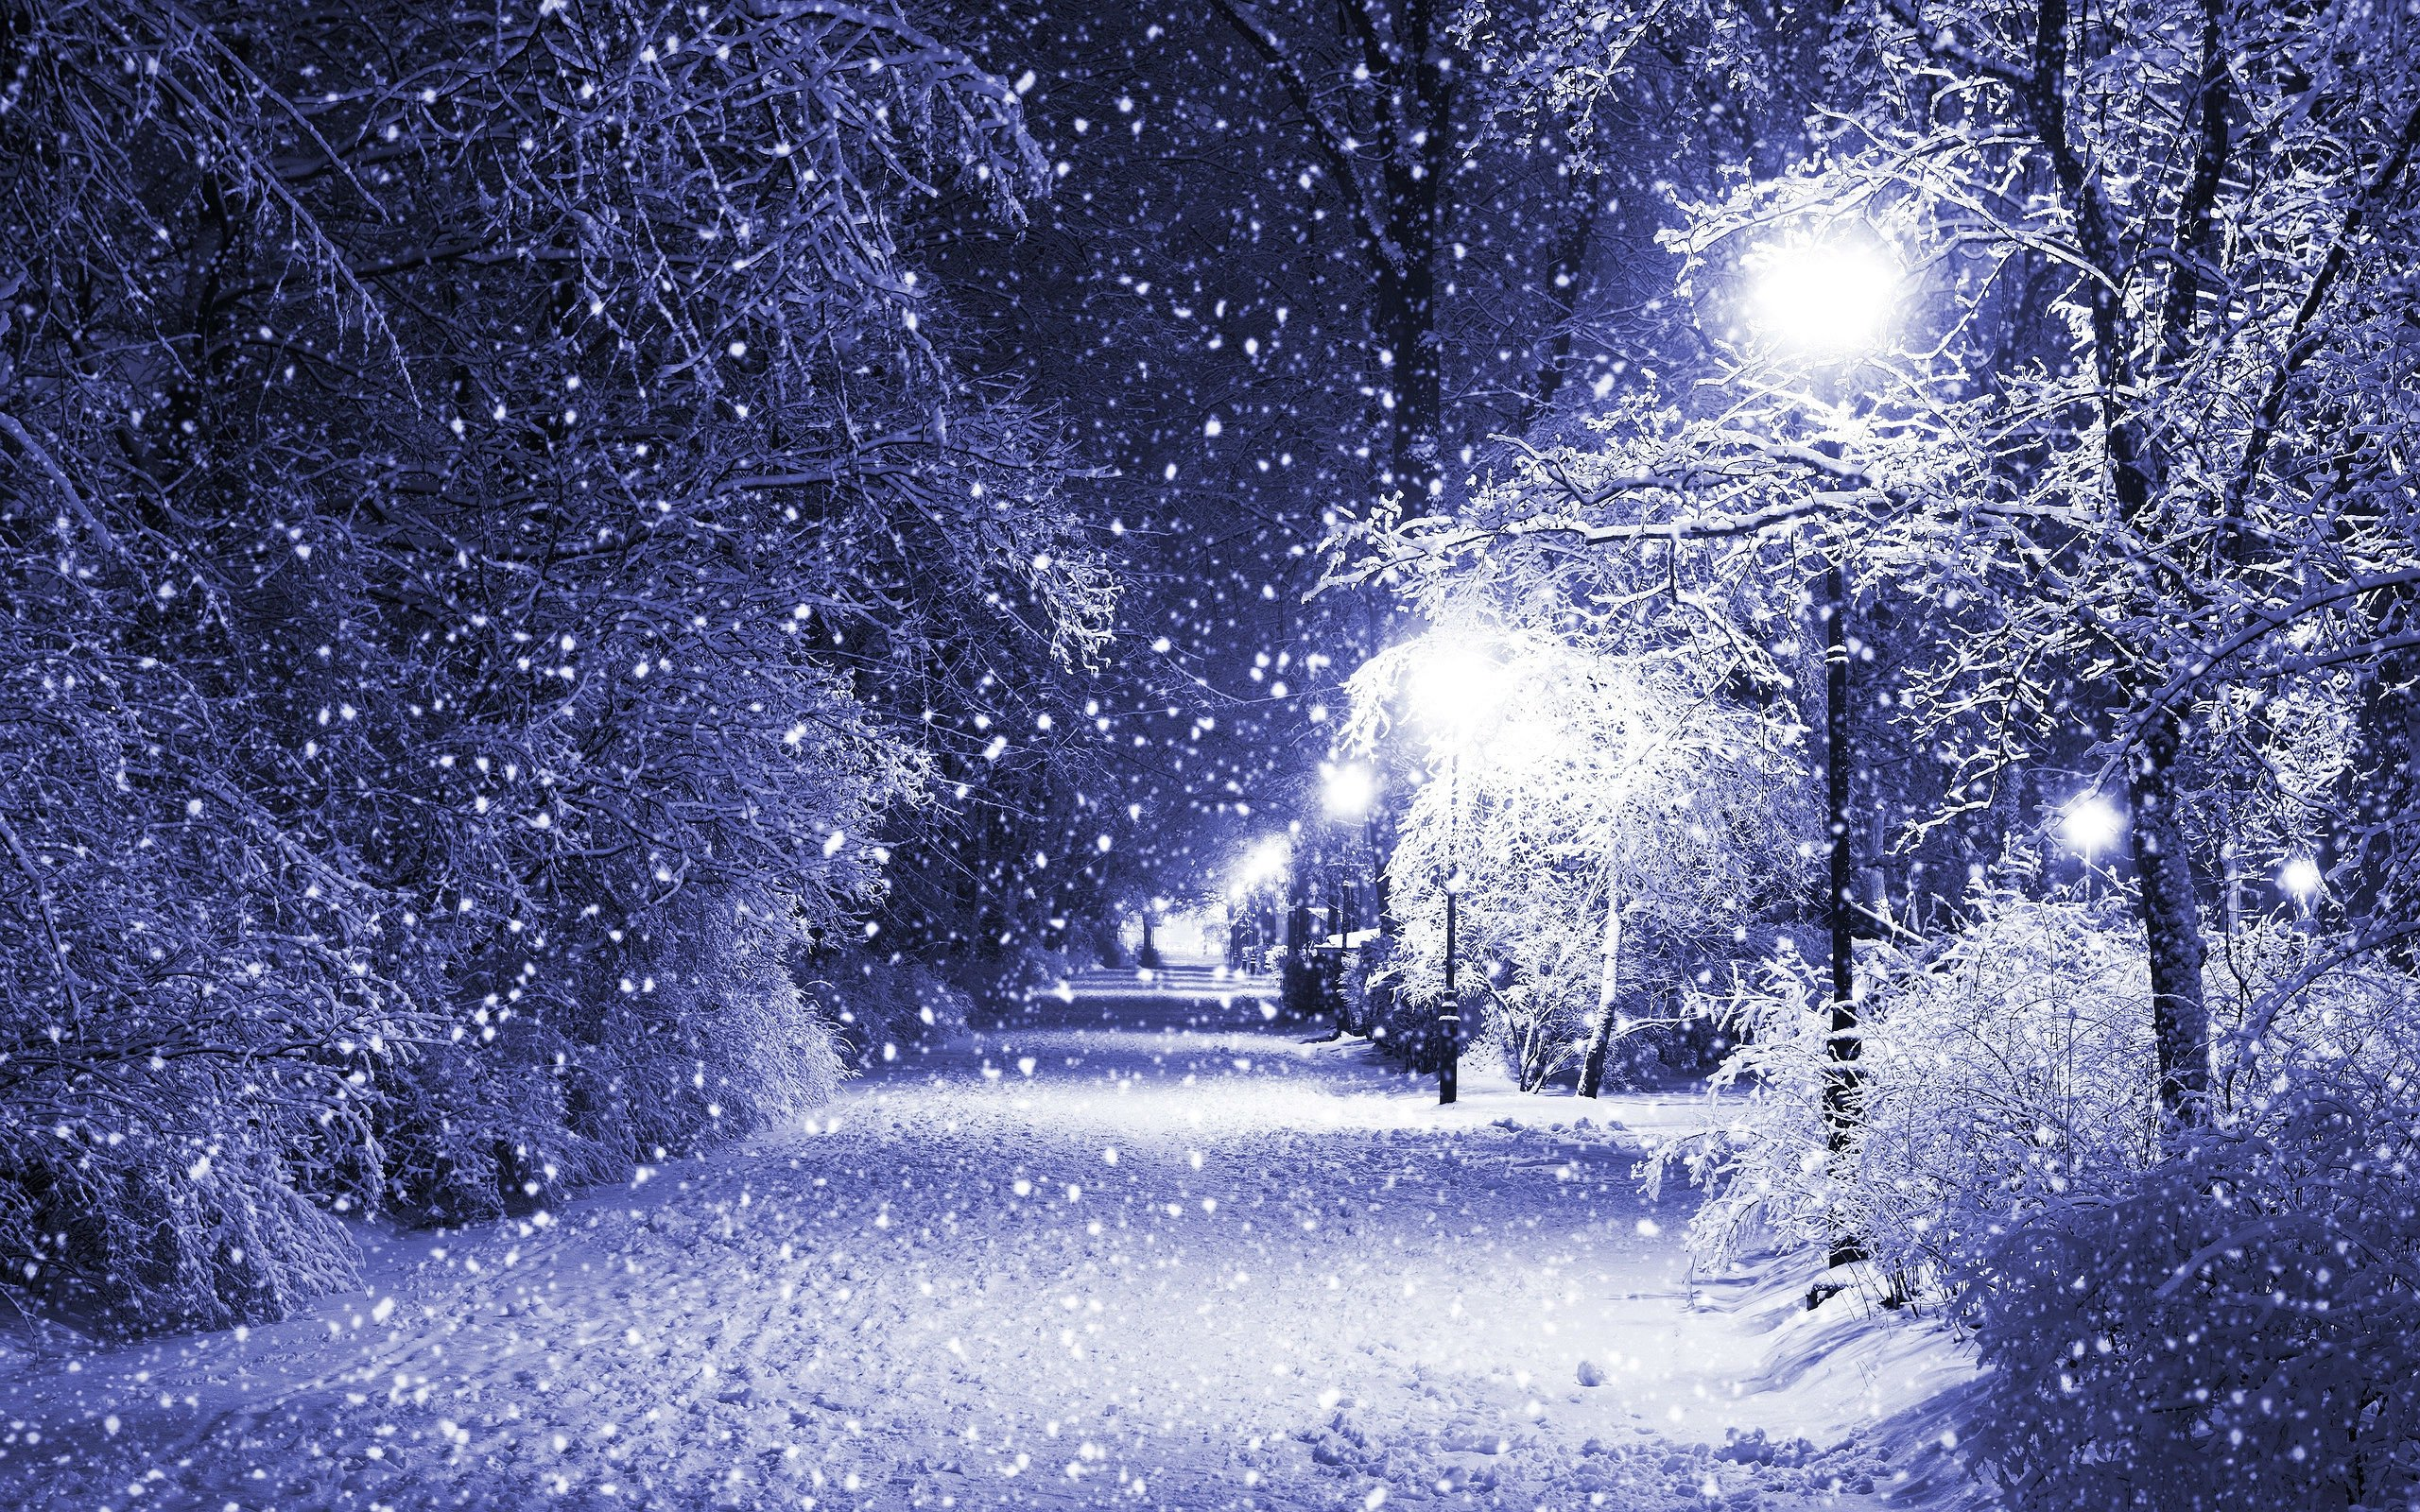 Winter Snow Lamp Post Wallpaper 2560x1600 555336